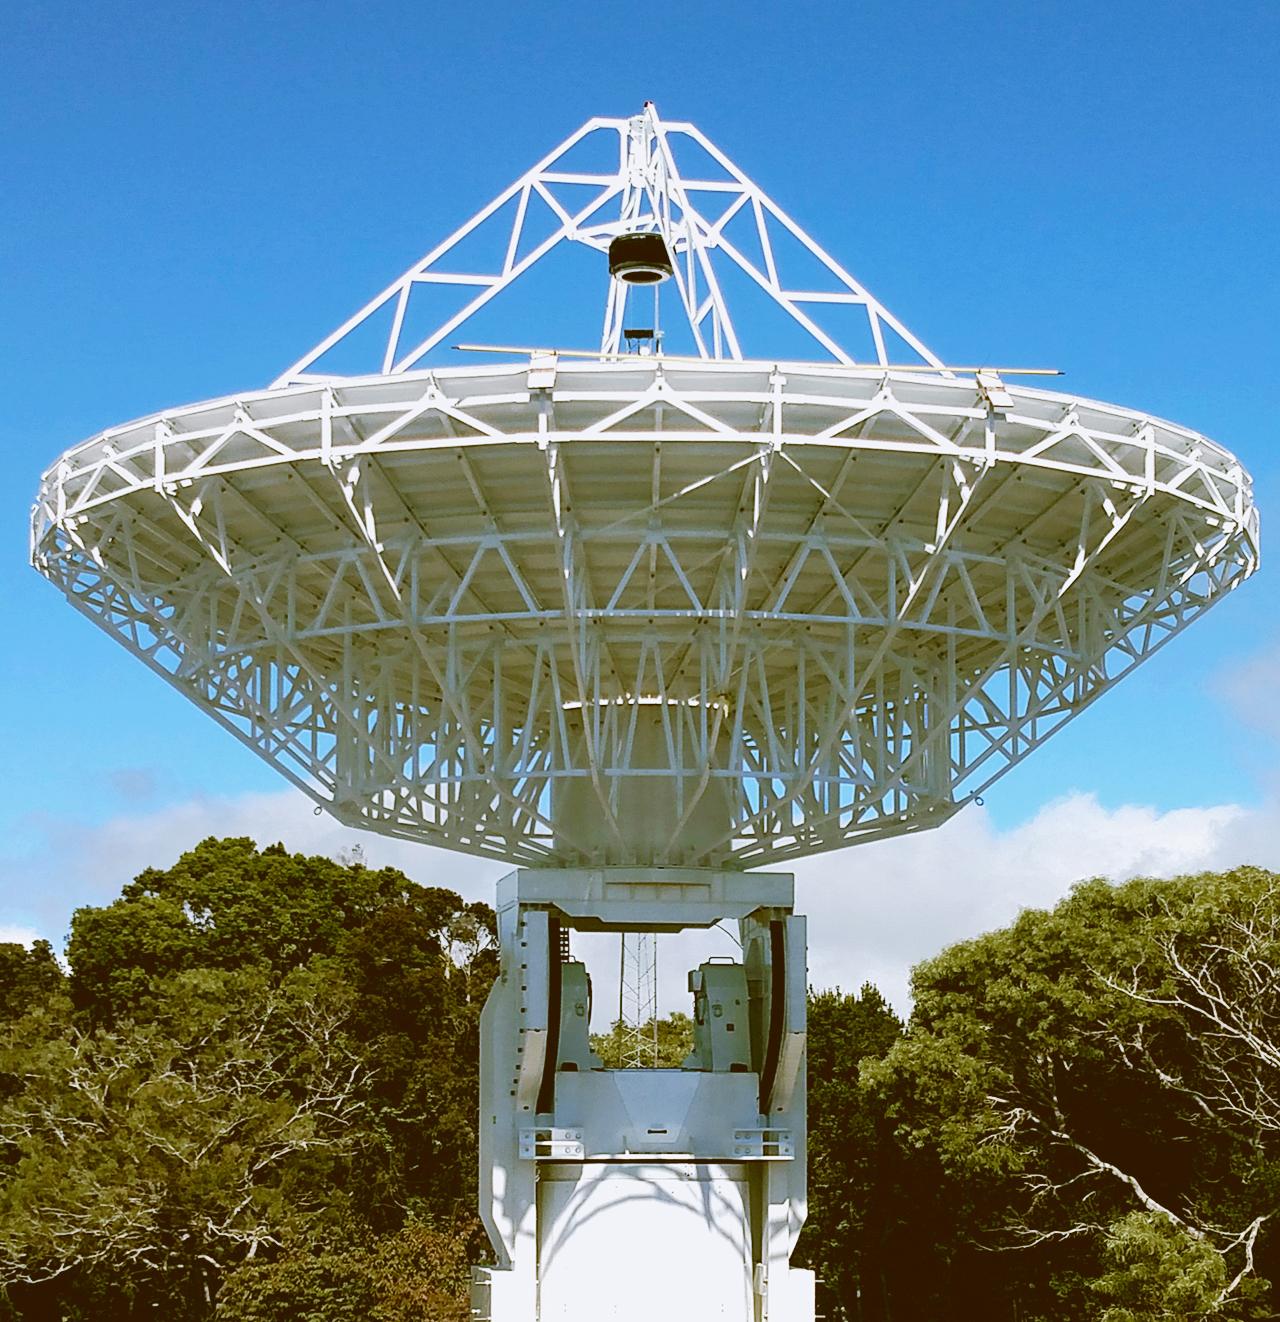 12m Antenna